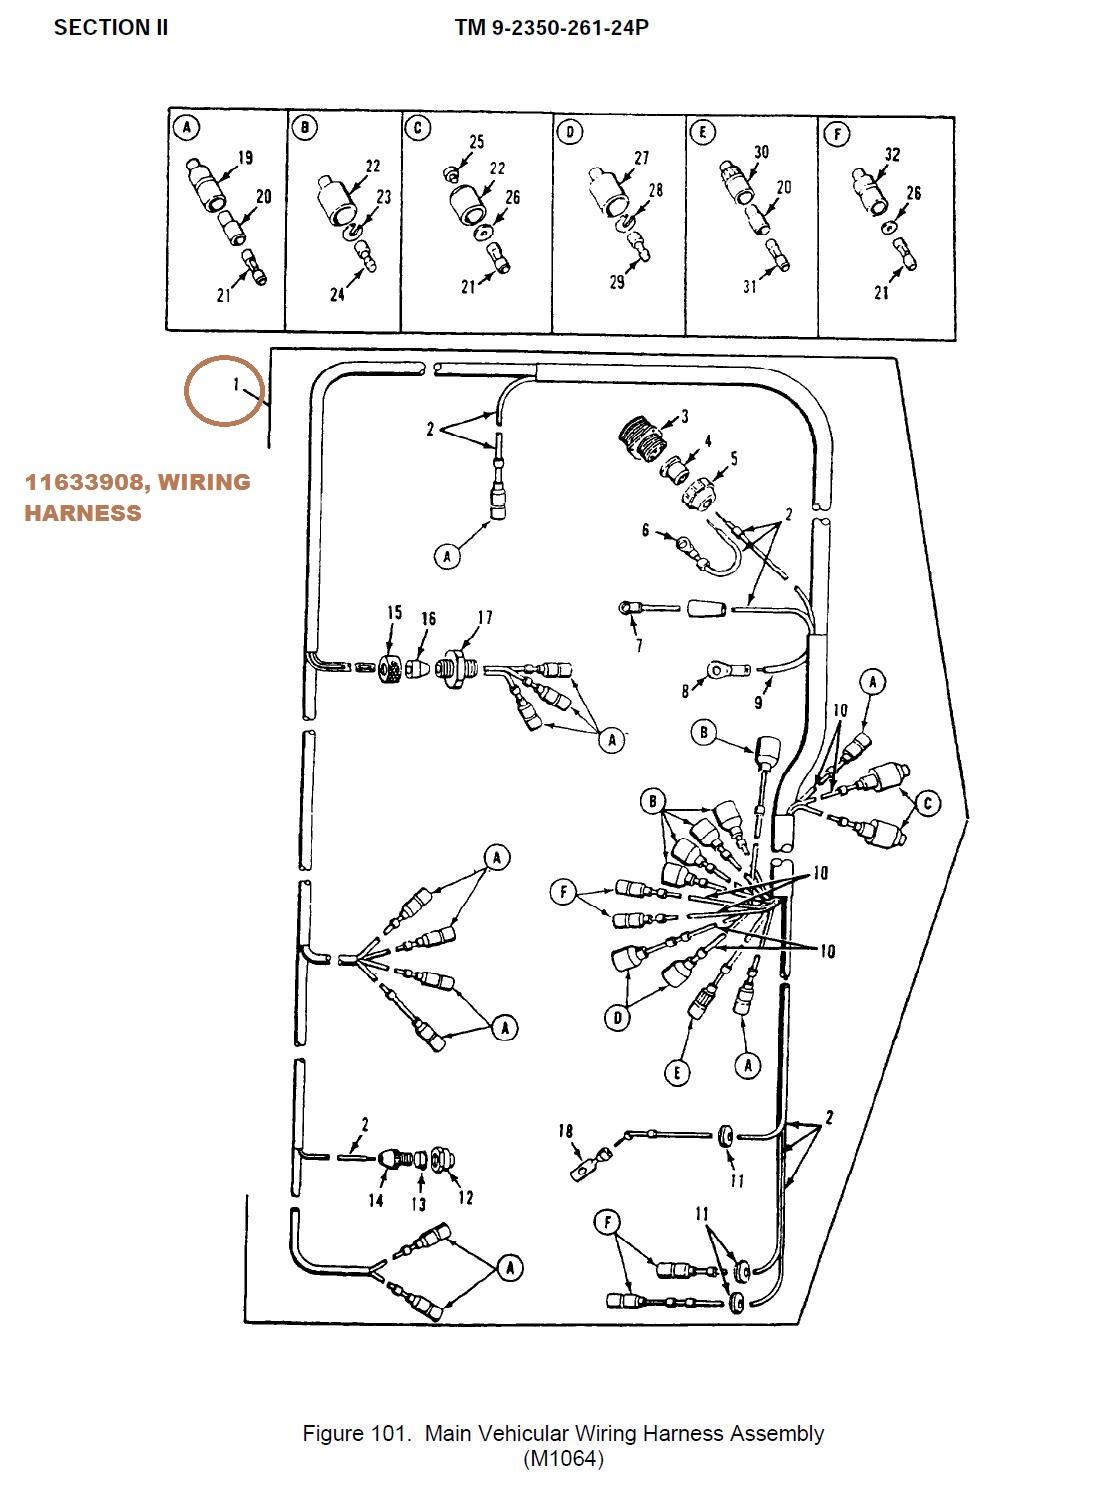 wiring harness bran - nsn 2590-00-409-4001